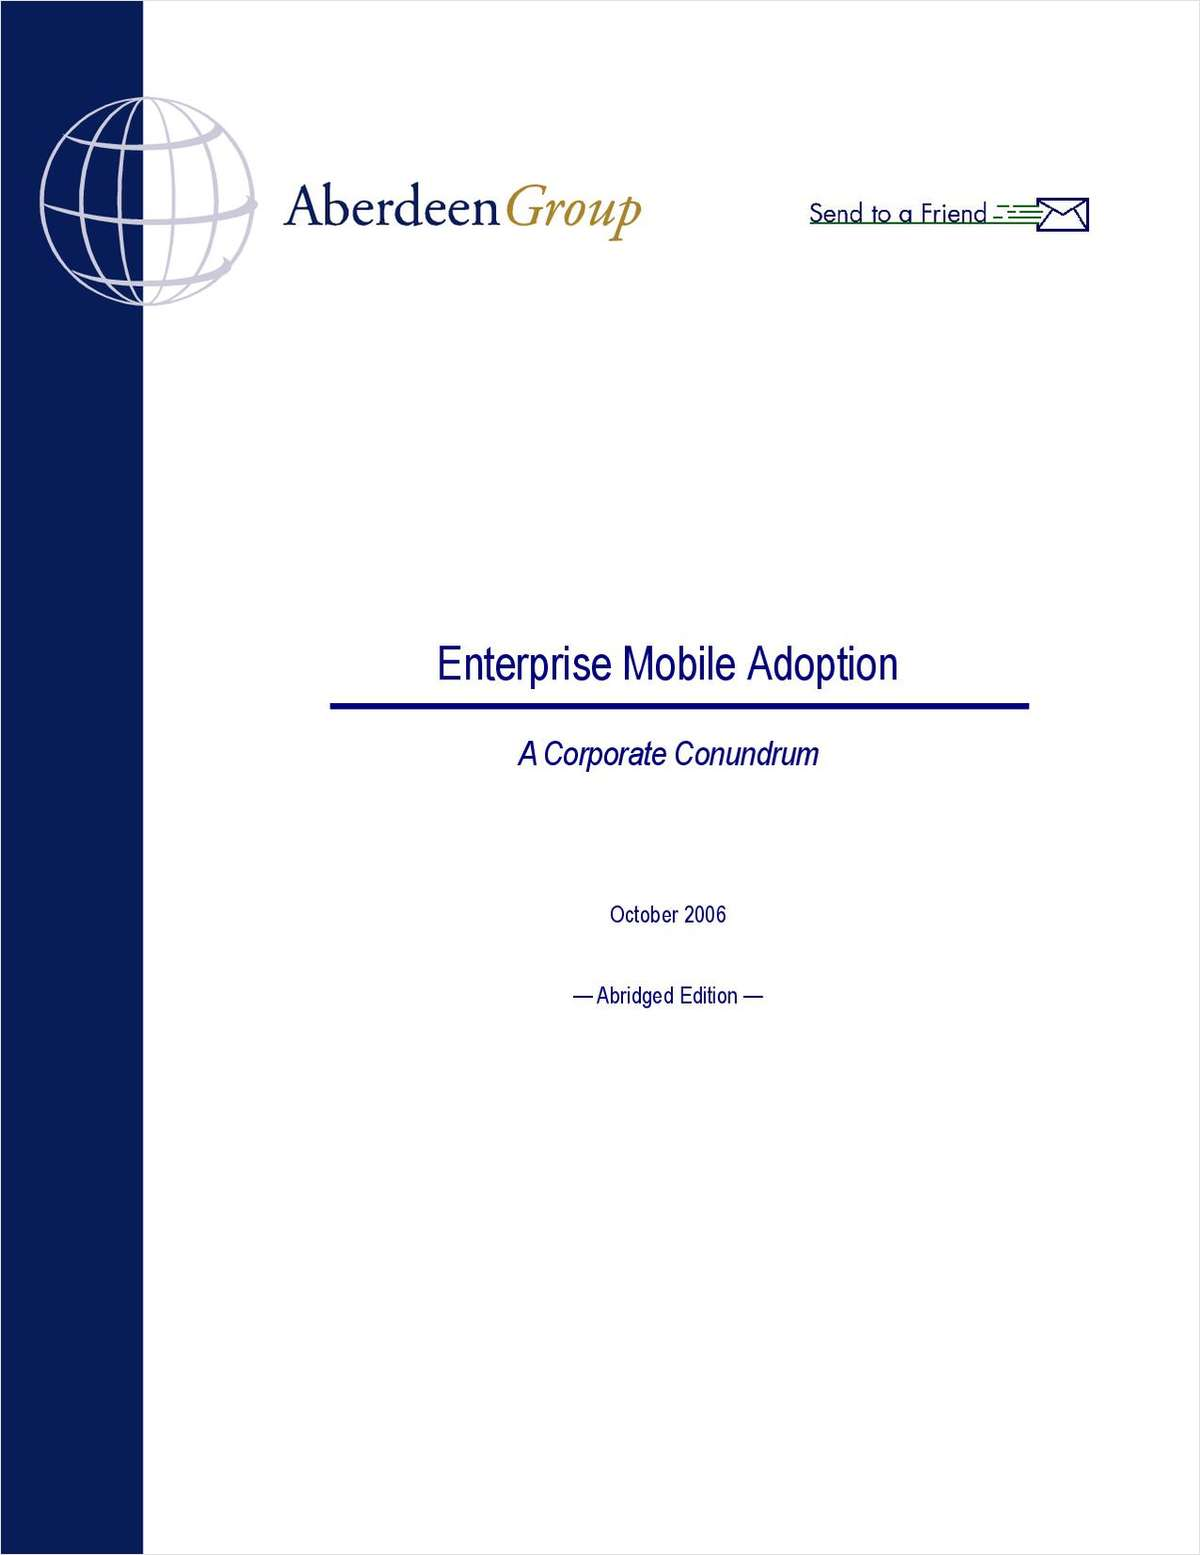 Enterprise Mobile Adoption